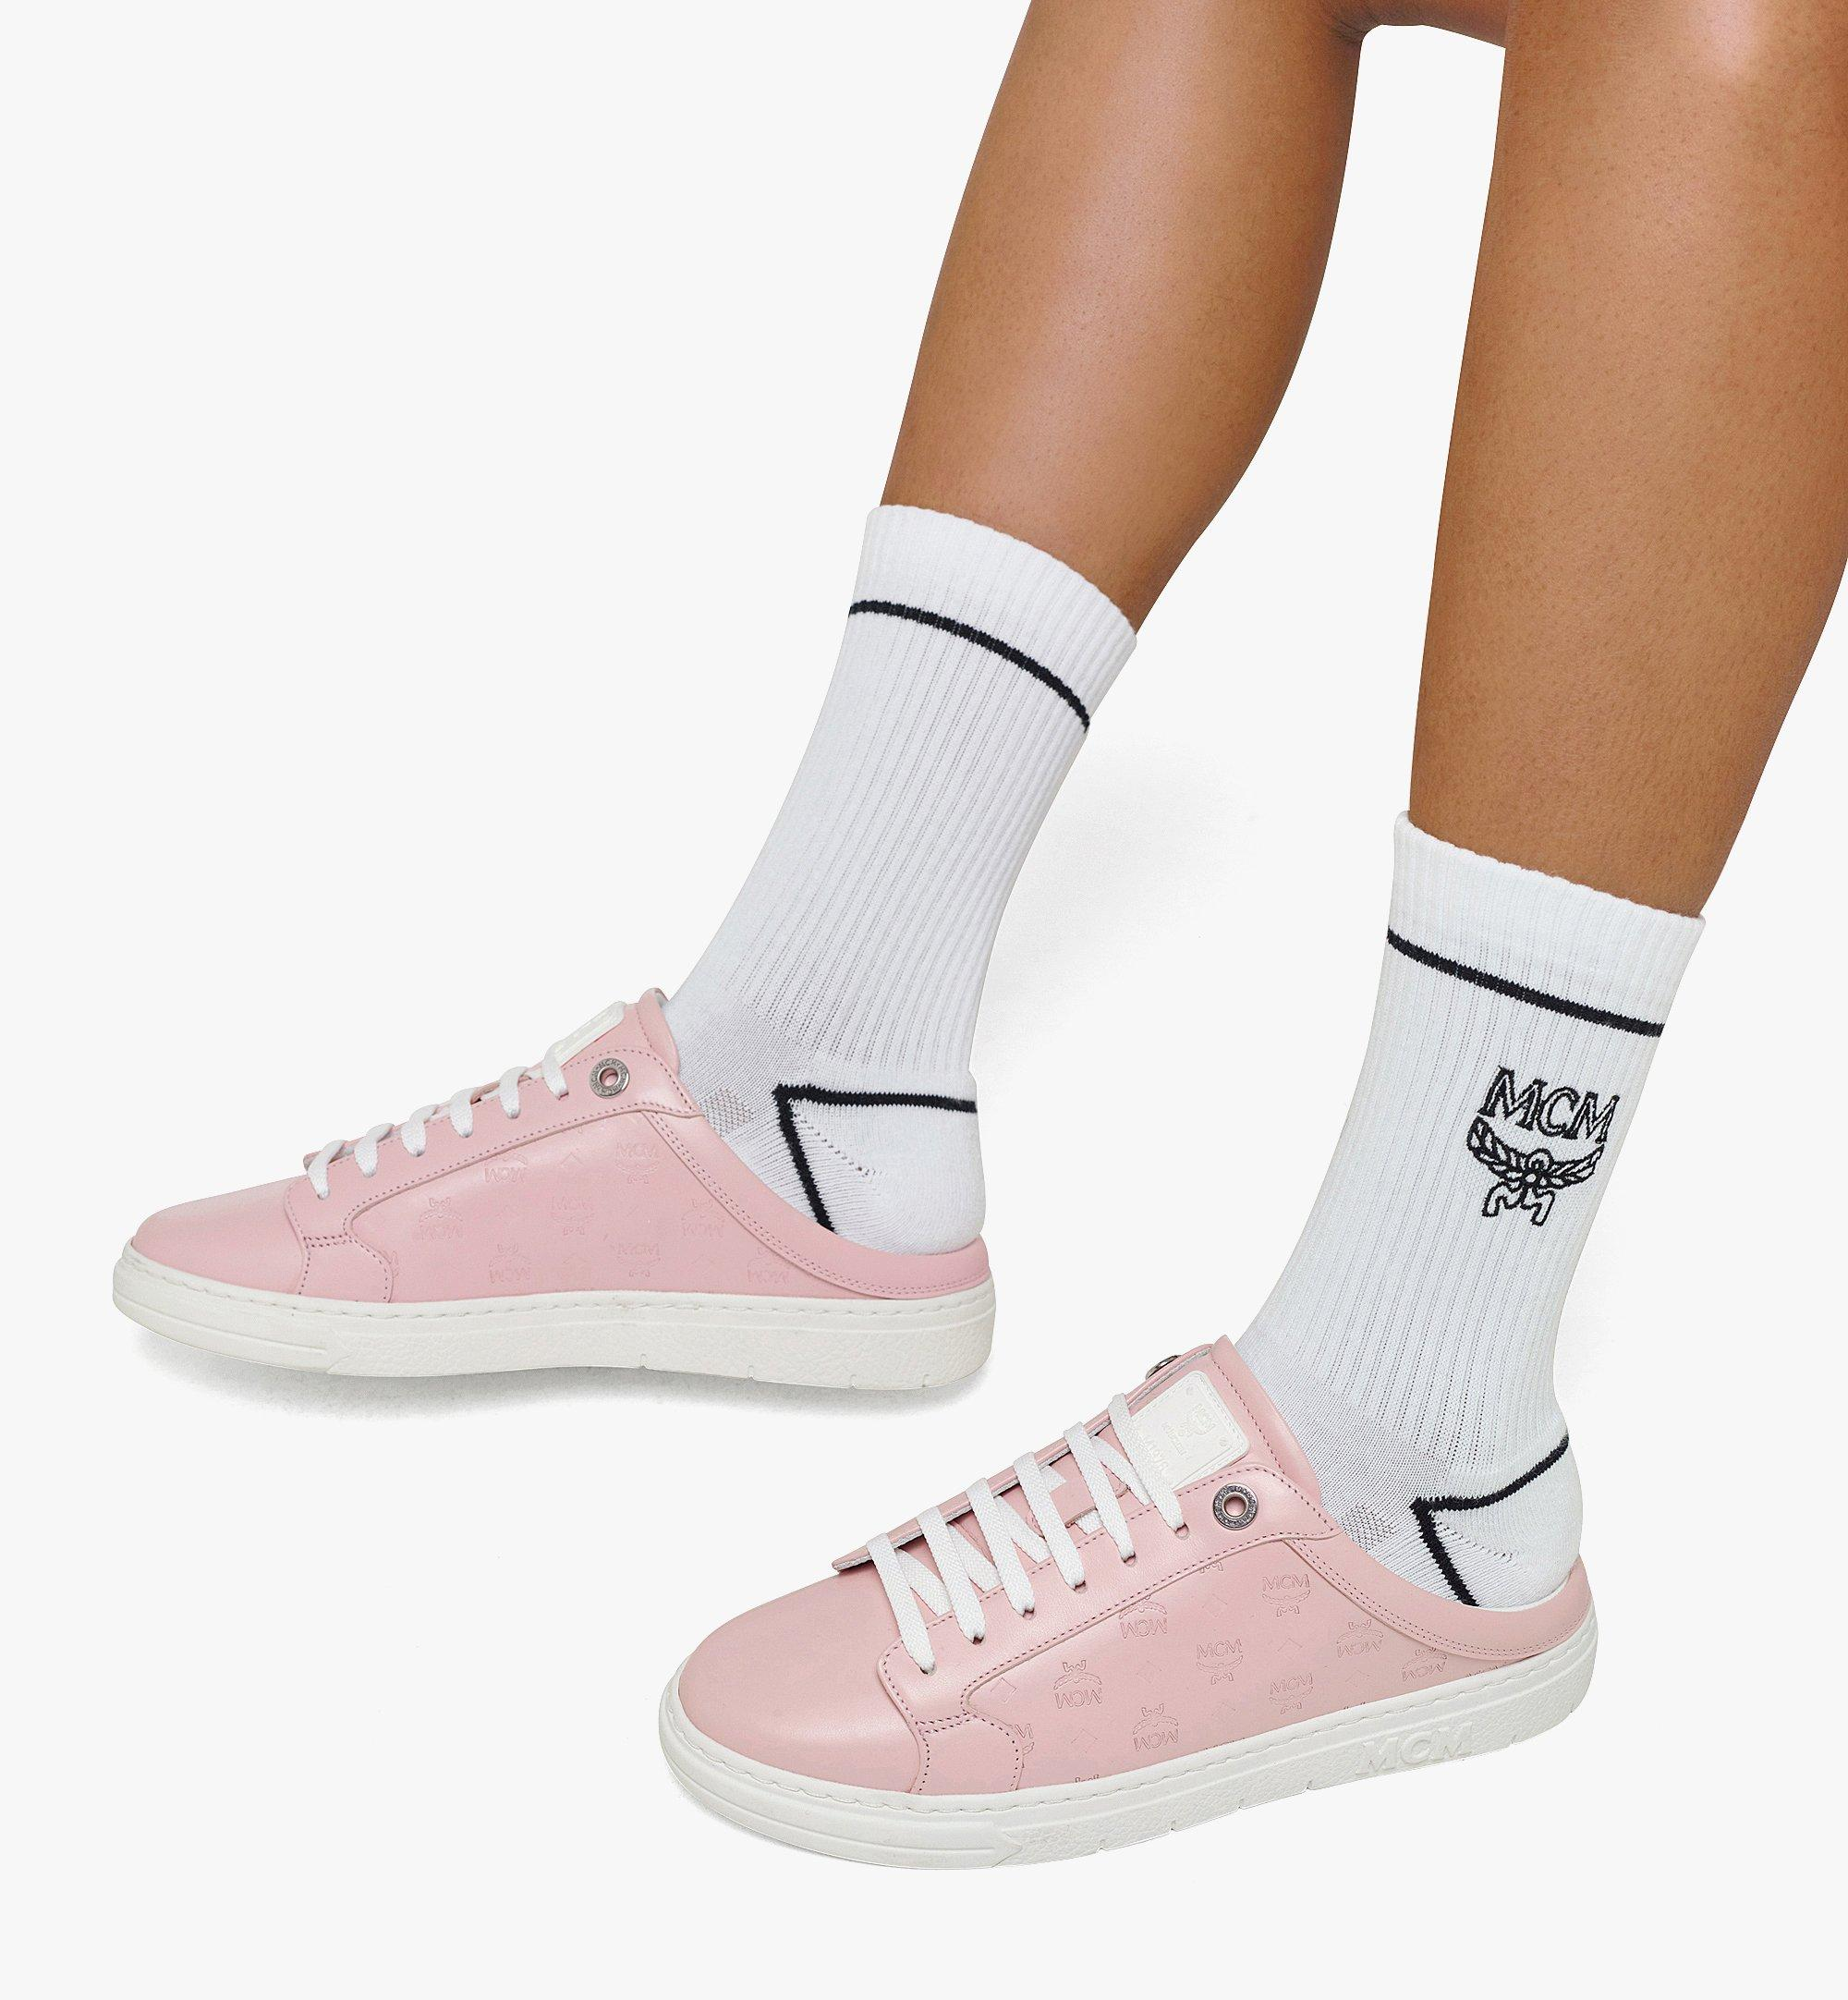 MCM Women's Terrain Lo Open Back Sneakers in Monogram Calf Leather Pink MESBAMM03QH036 Alternate View 2